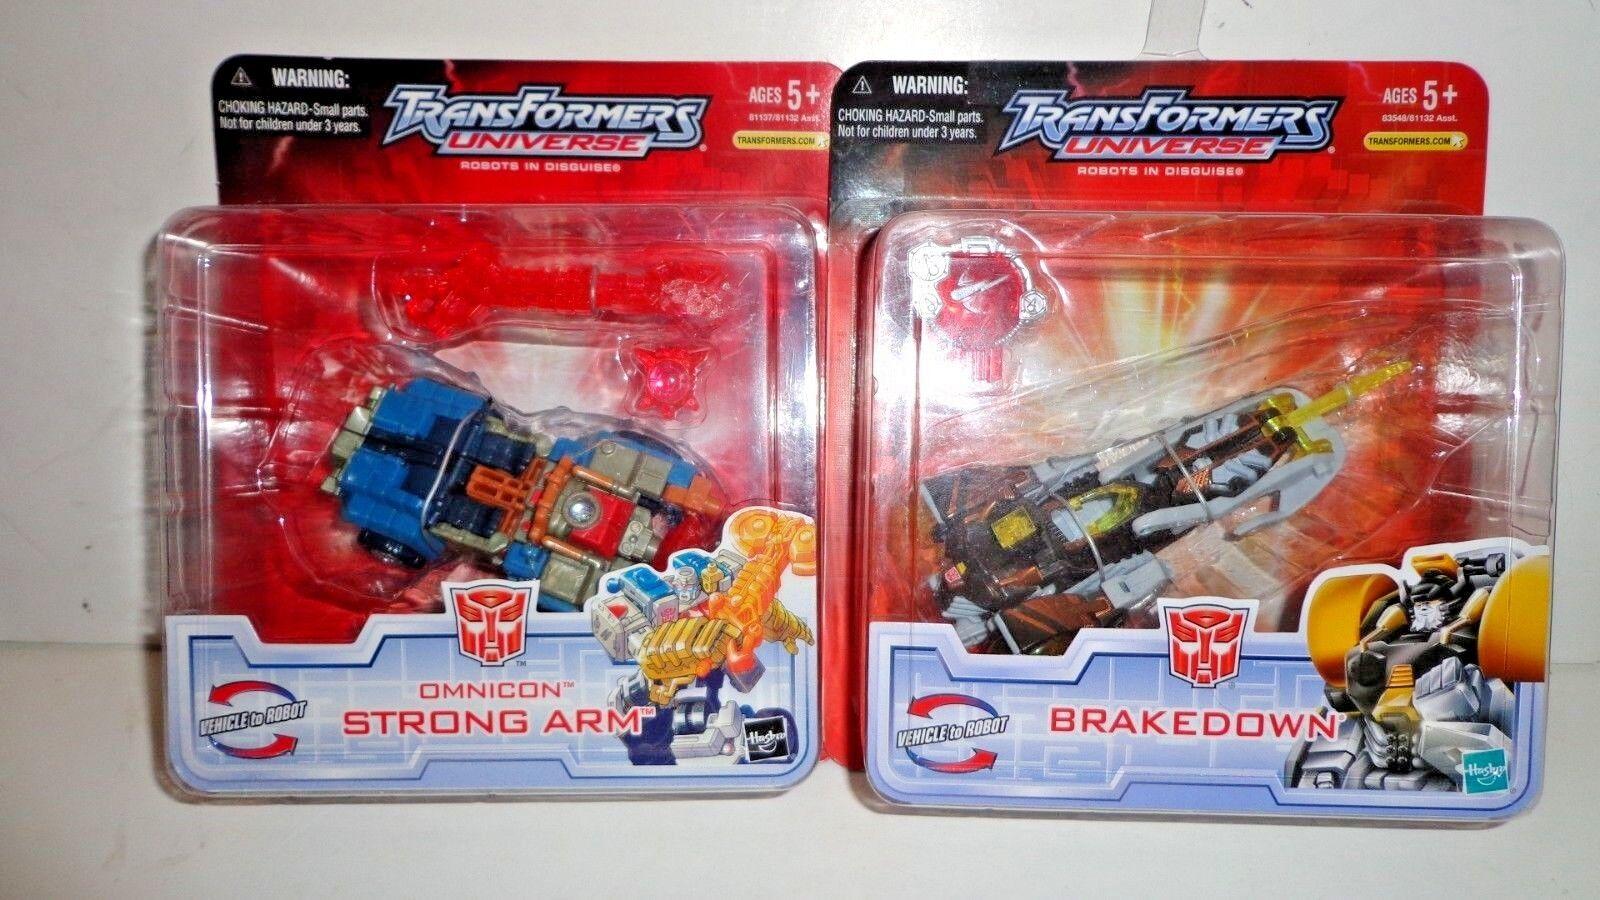 Transformers universe 2005 lot of 2 moc Strong Arm & Breakdown moc,misp,mib